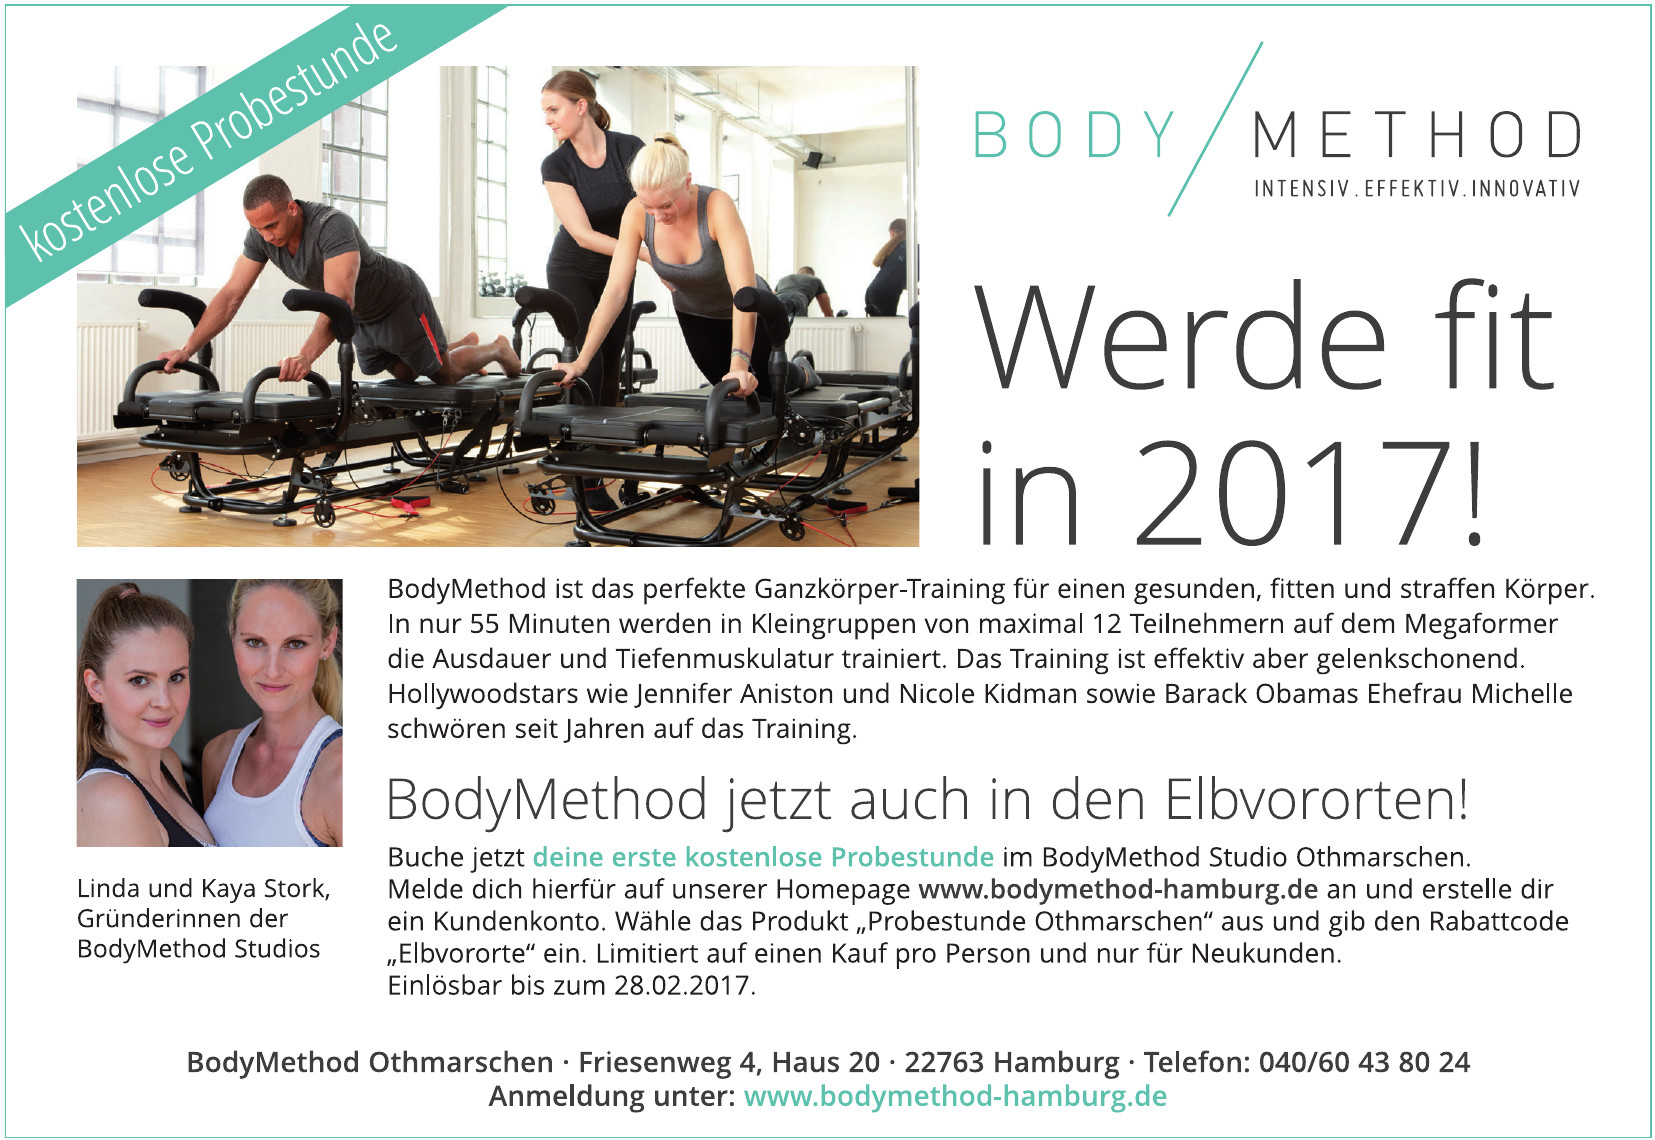 BodyMethod Othmarschen